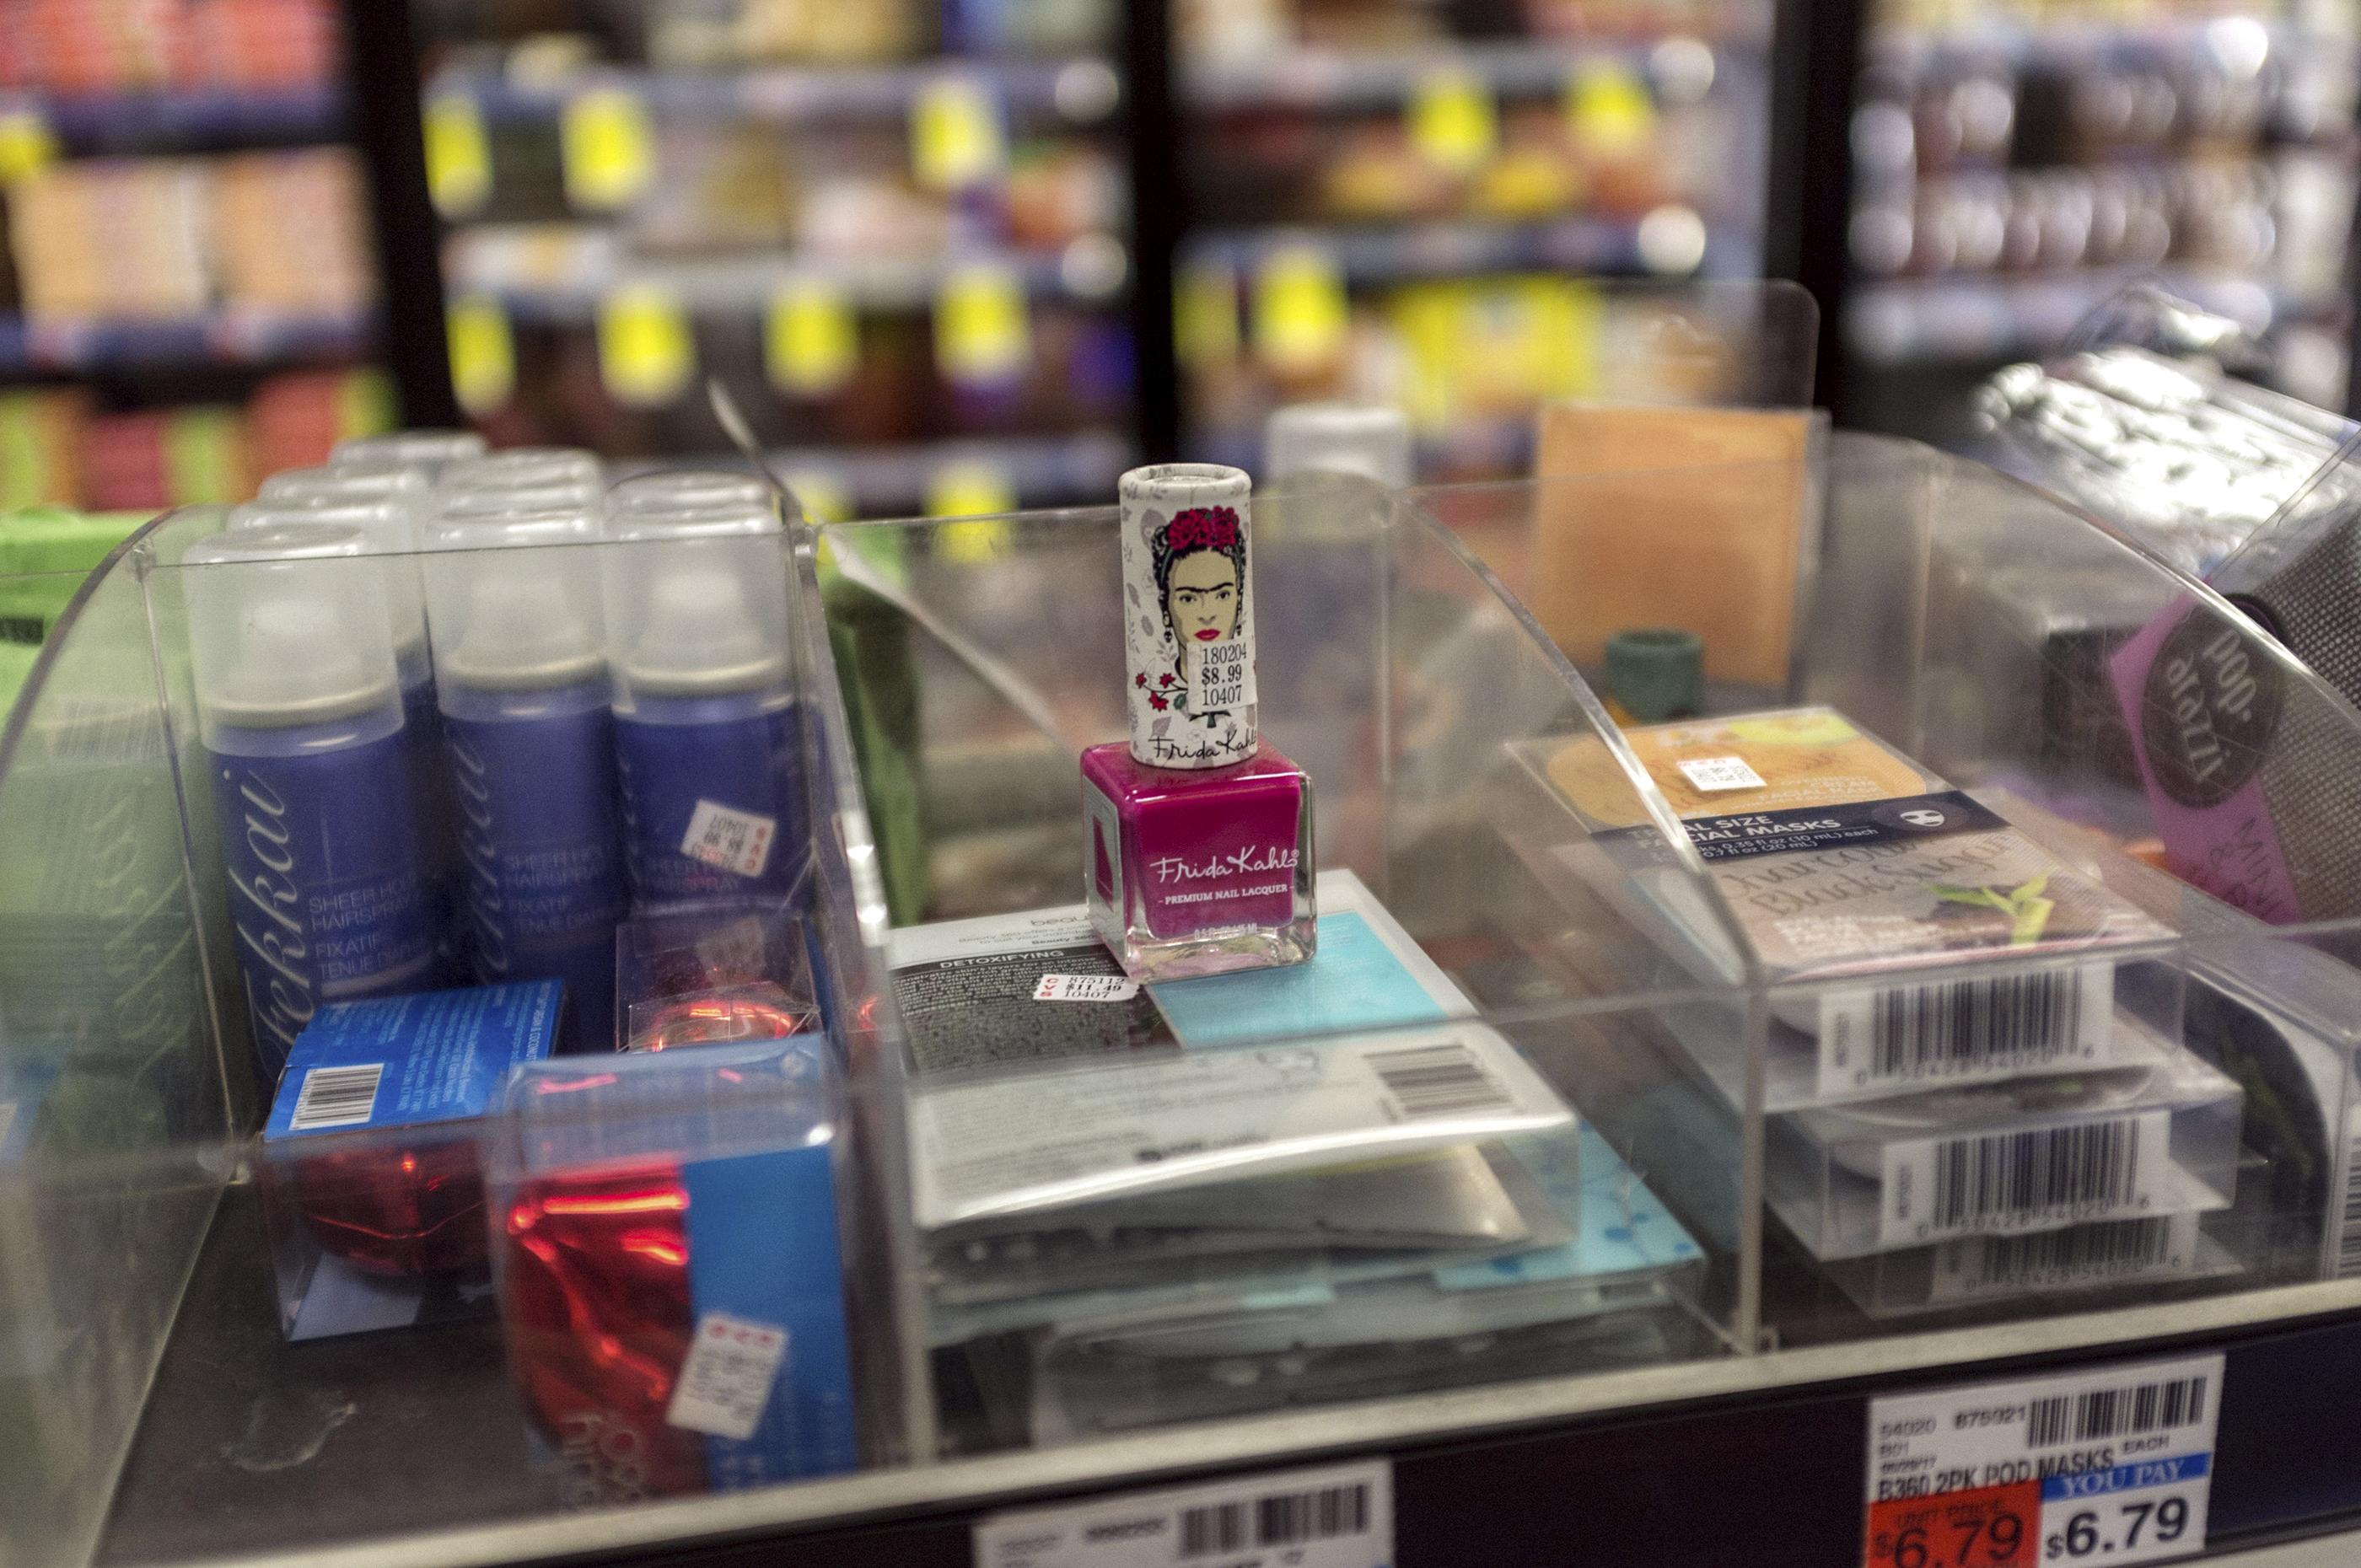 Frida Kahlo branded nail varnish for sale in a CVS pharmacy in Manhattan, New York City.